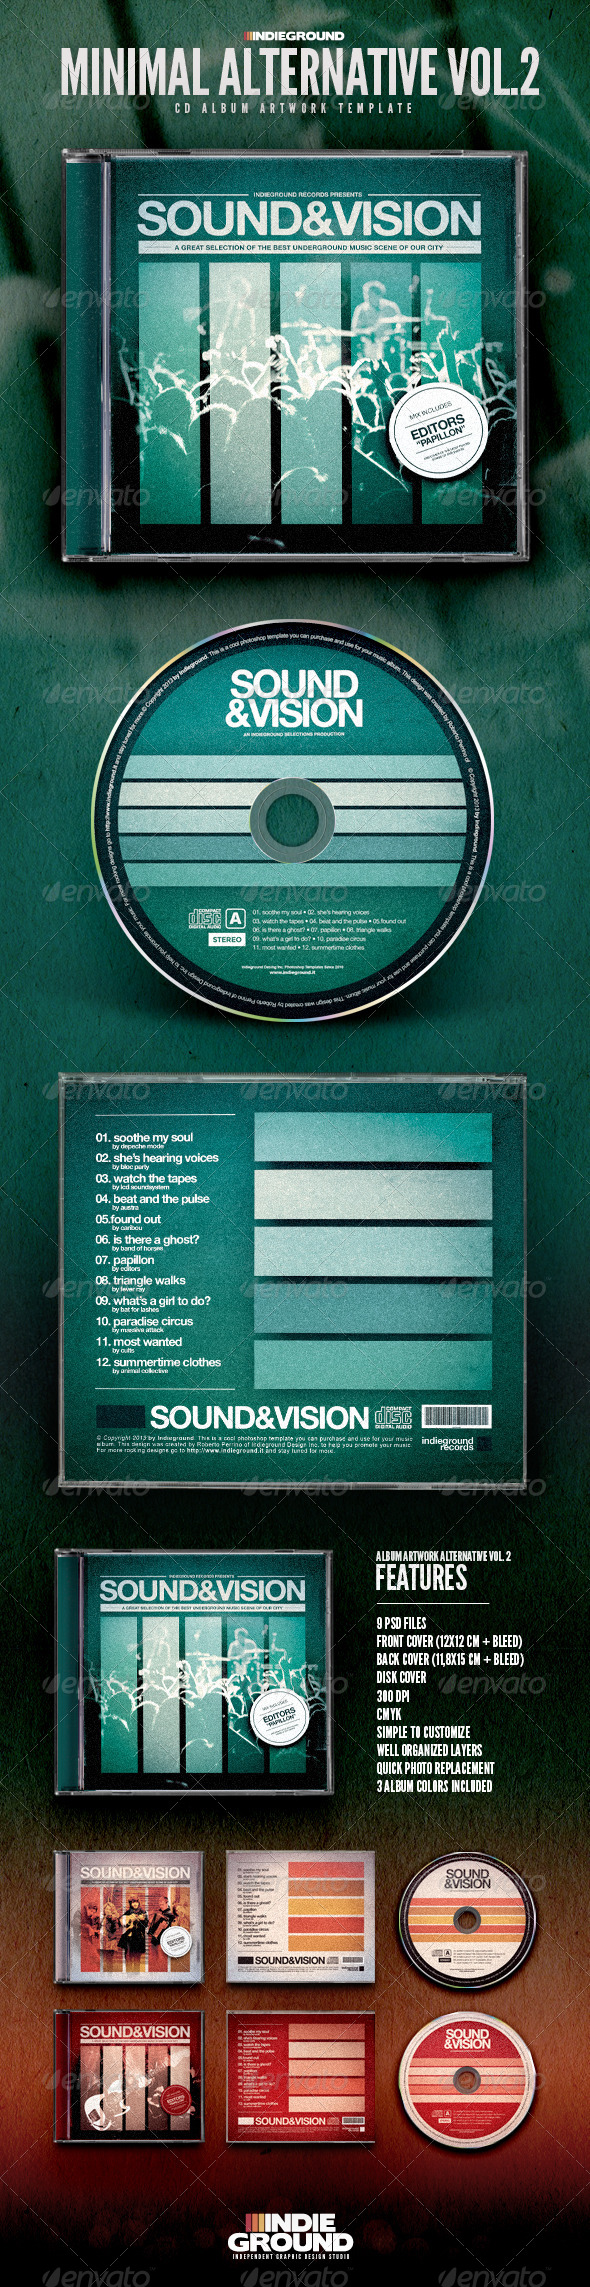 GraphicRiver Minimal Alternative CD Album Artwork Vol 2 6836036